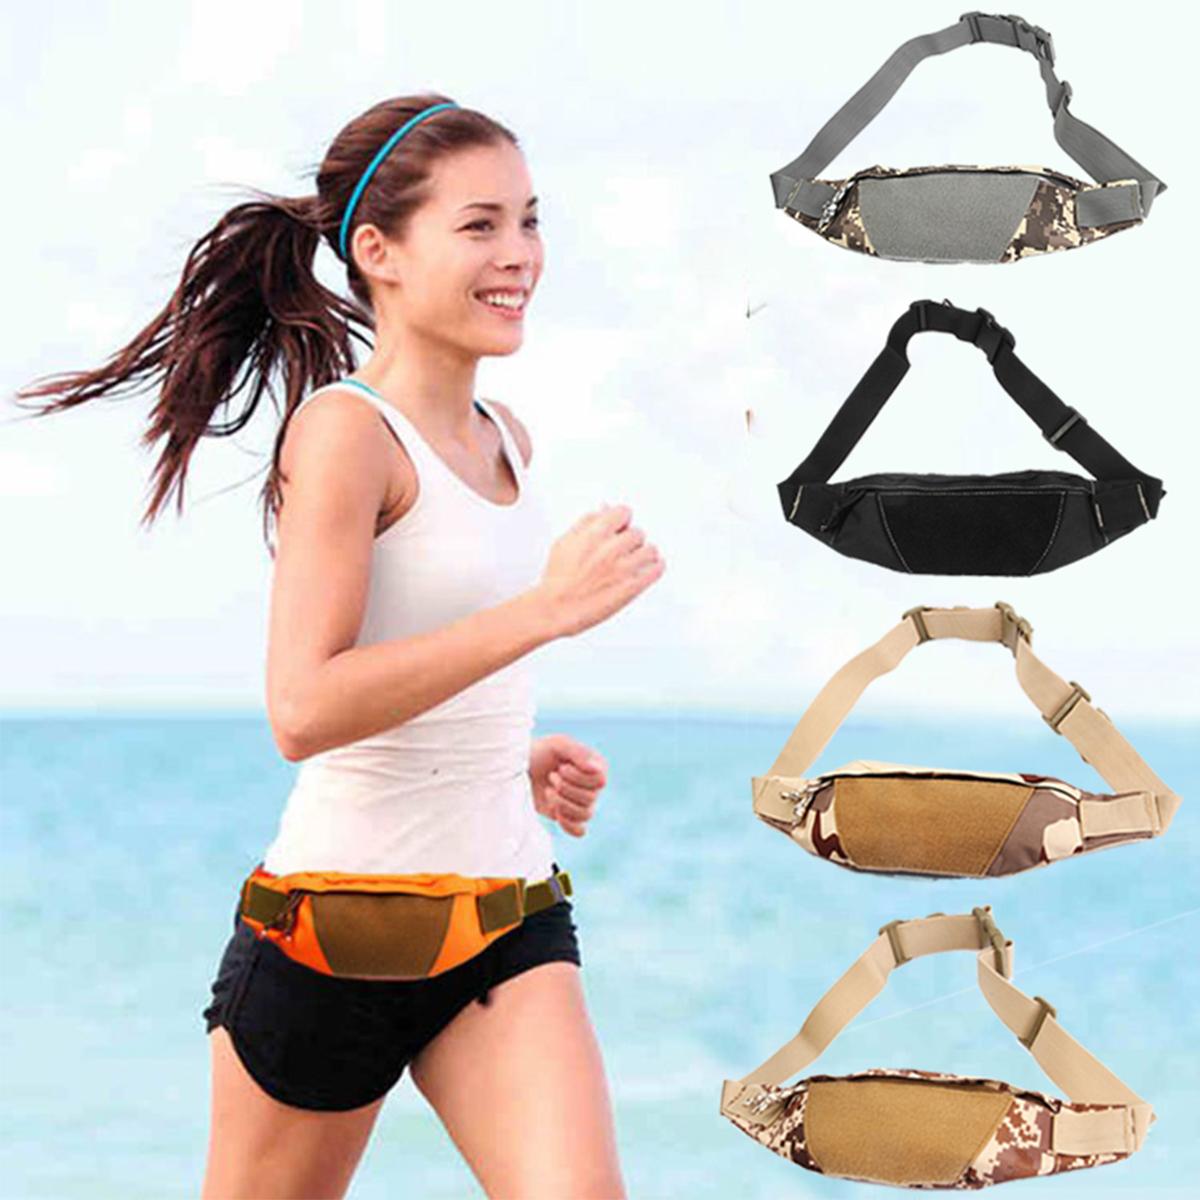 Outdoor Women Men Tactical Waist Bag Adjustable Sports Bag Camping Hiking Traveling Climbing Bag